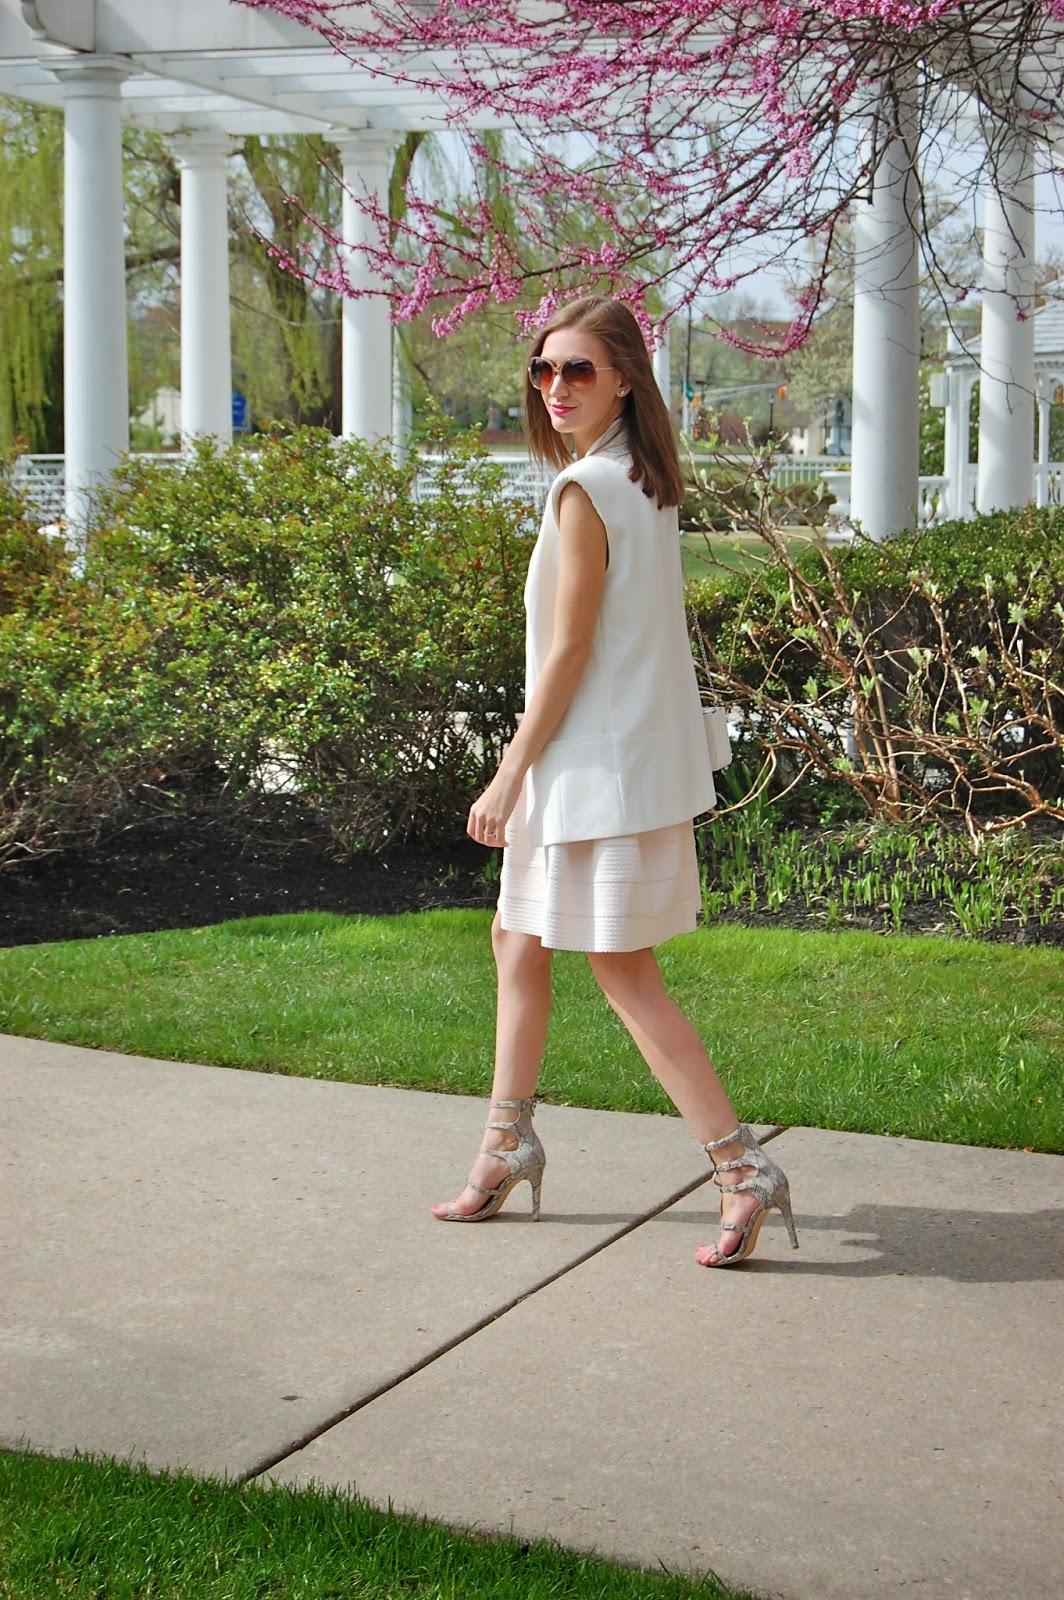 Wearing Trouve sema detail power vest from Nordstrom, Francesca's bandaged pink strapless dress, Bcbgeneration manci sandals, spring dress